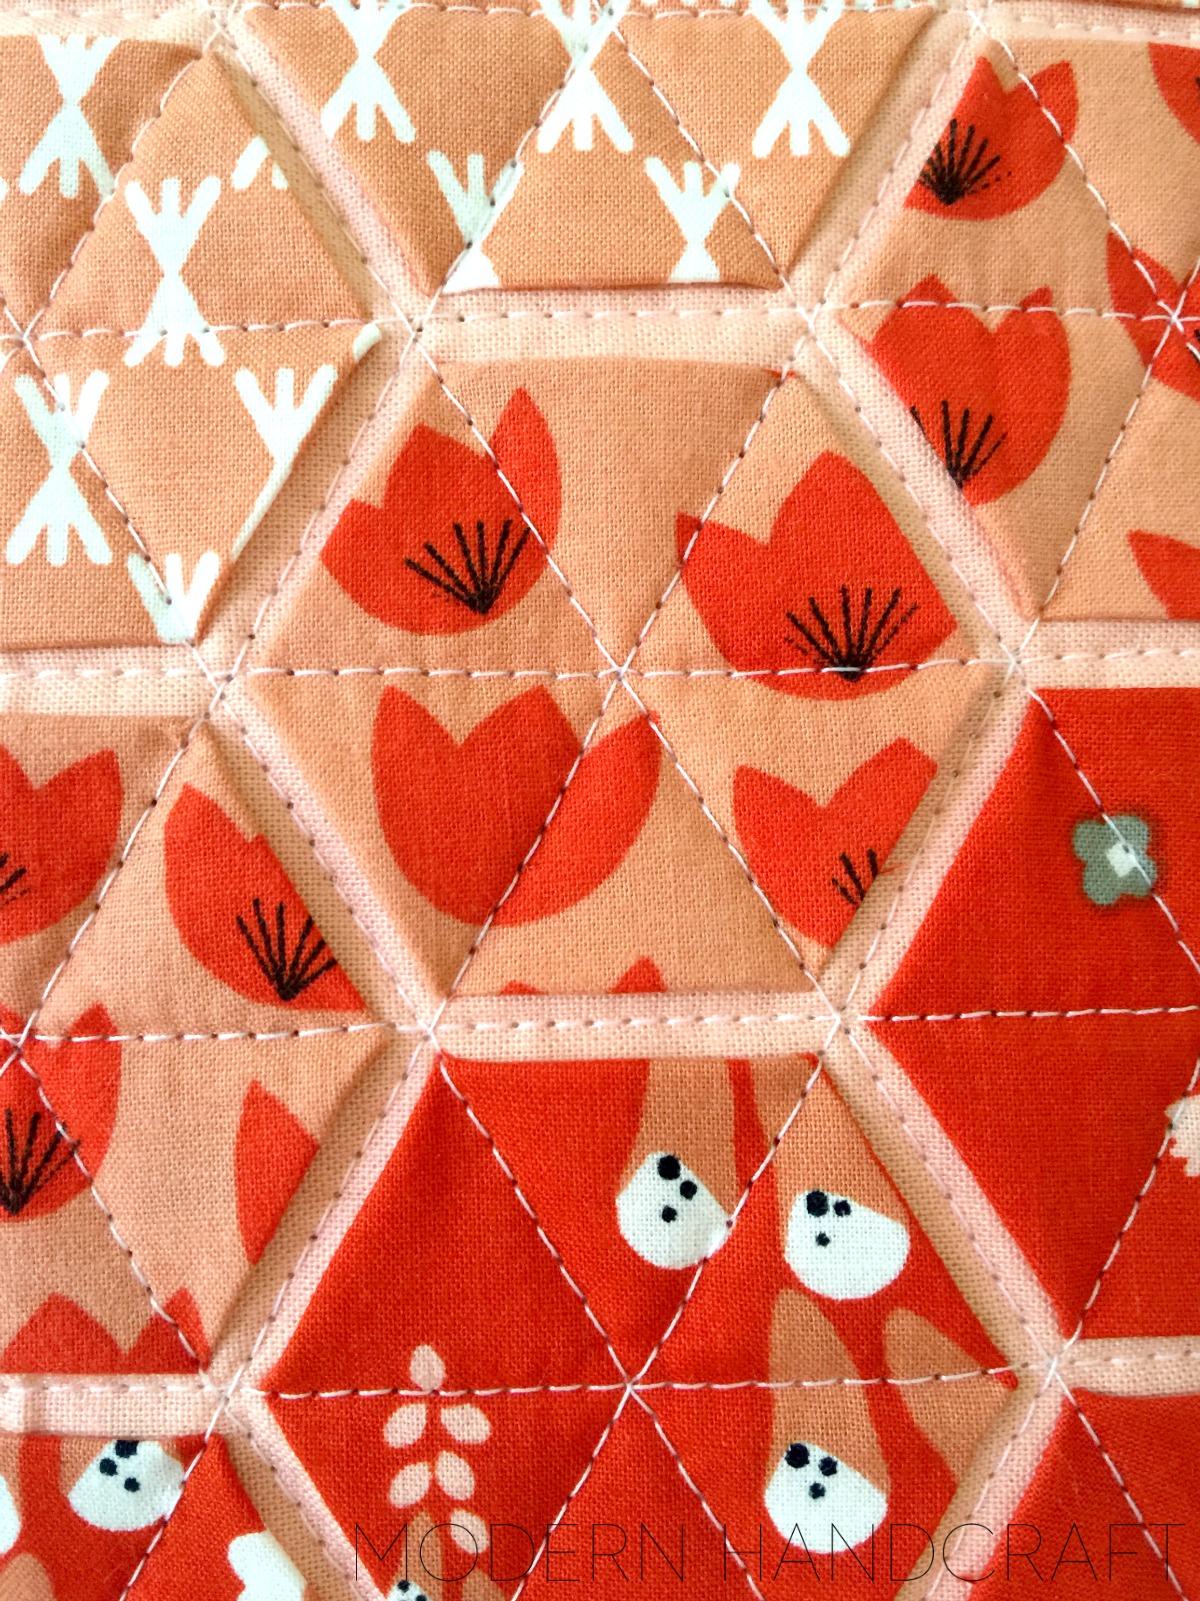 Modern Handcraft: Foxglove fabric by Aneela Hoey